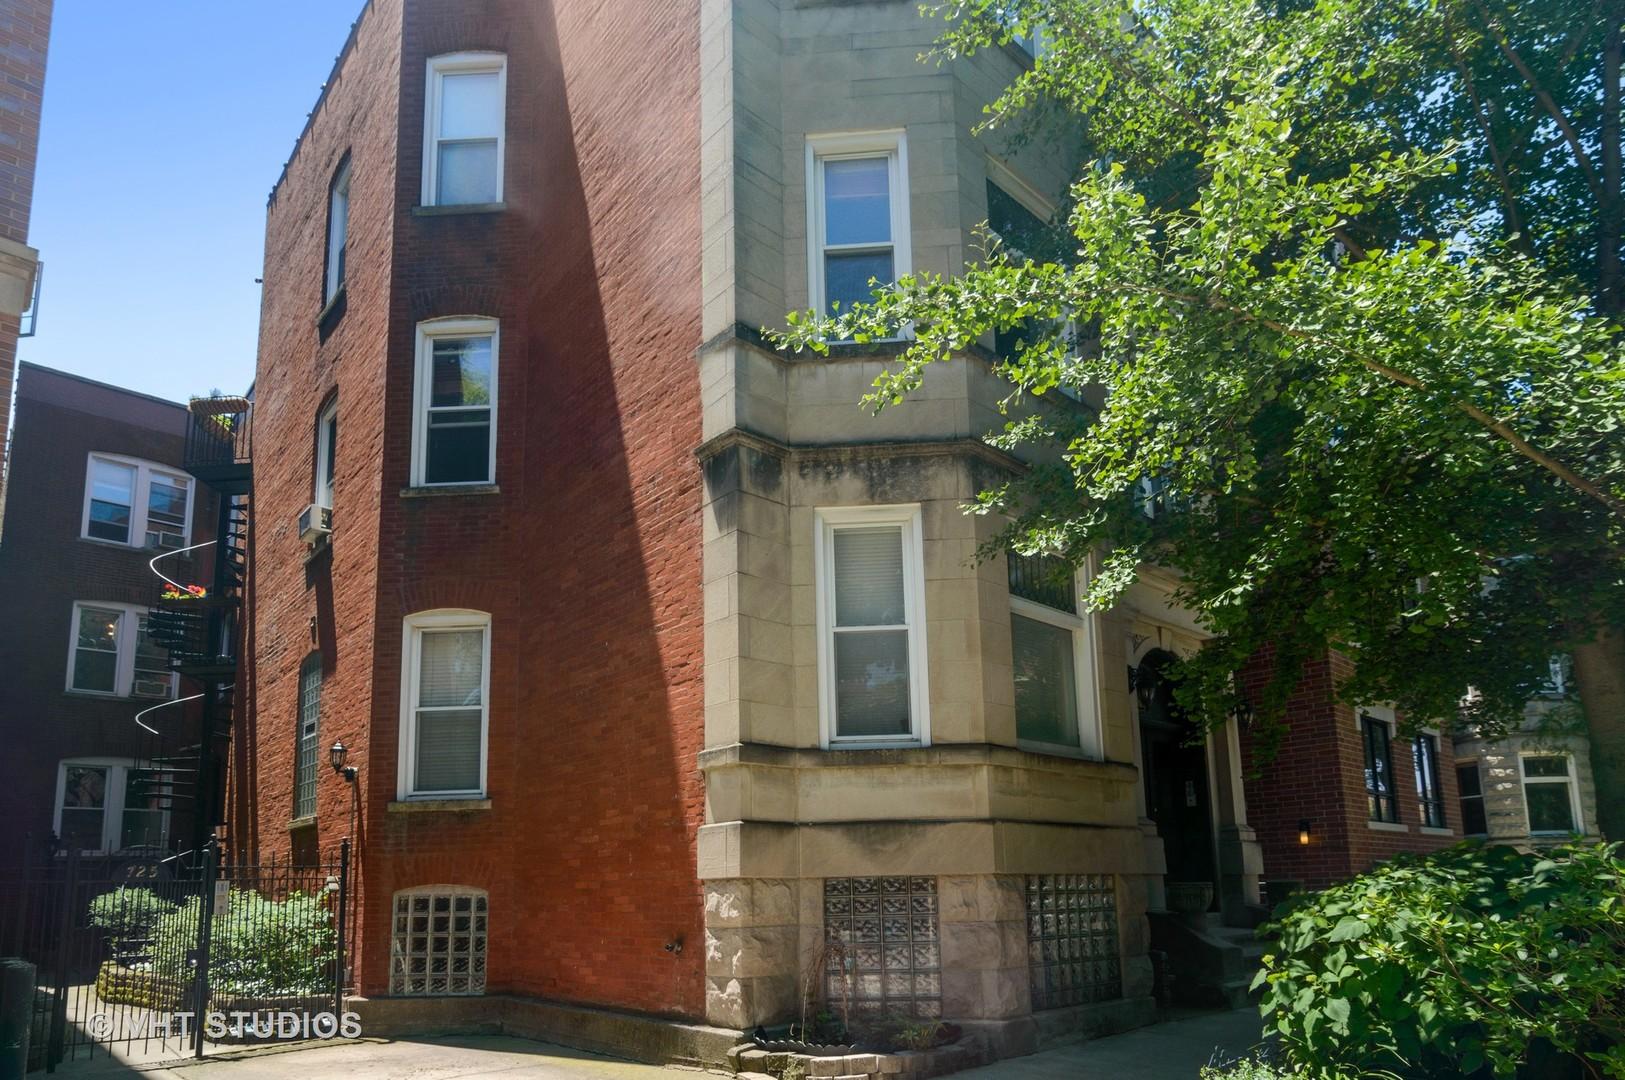 725 ALDINE Avenue, Chicago, Illinois 60657, 2 Bedrooms Bedrooms, ,1 BathroomBathrooms,Attached Single,For Sale,ALDINE,10113374